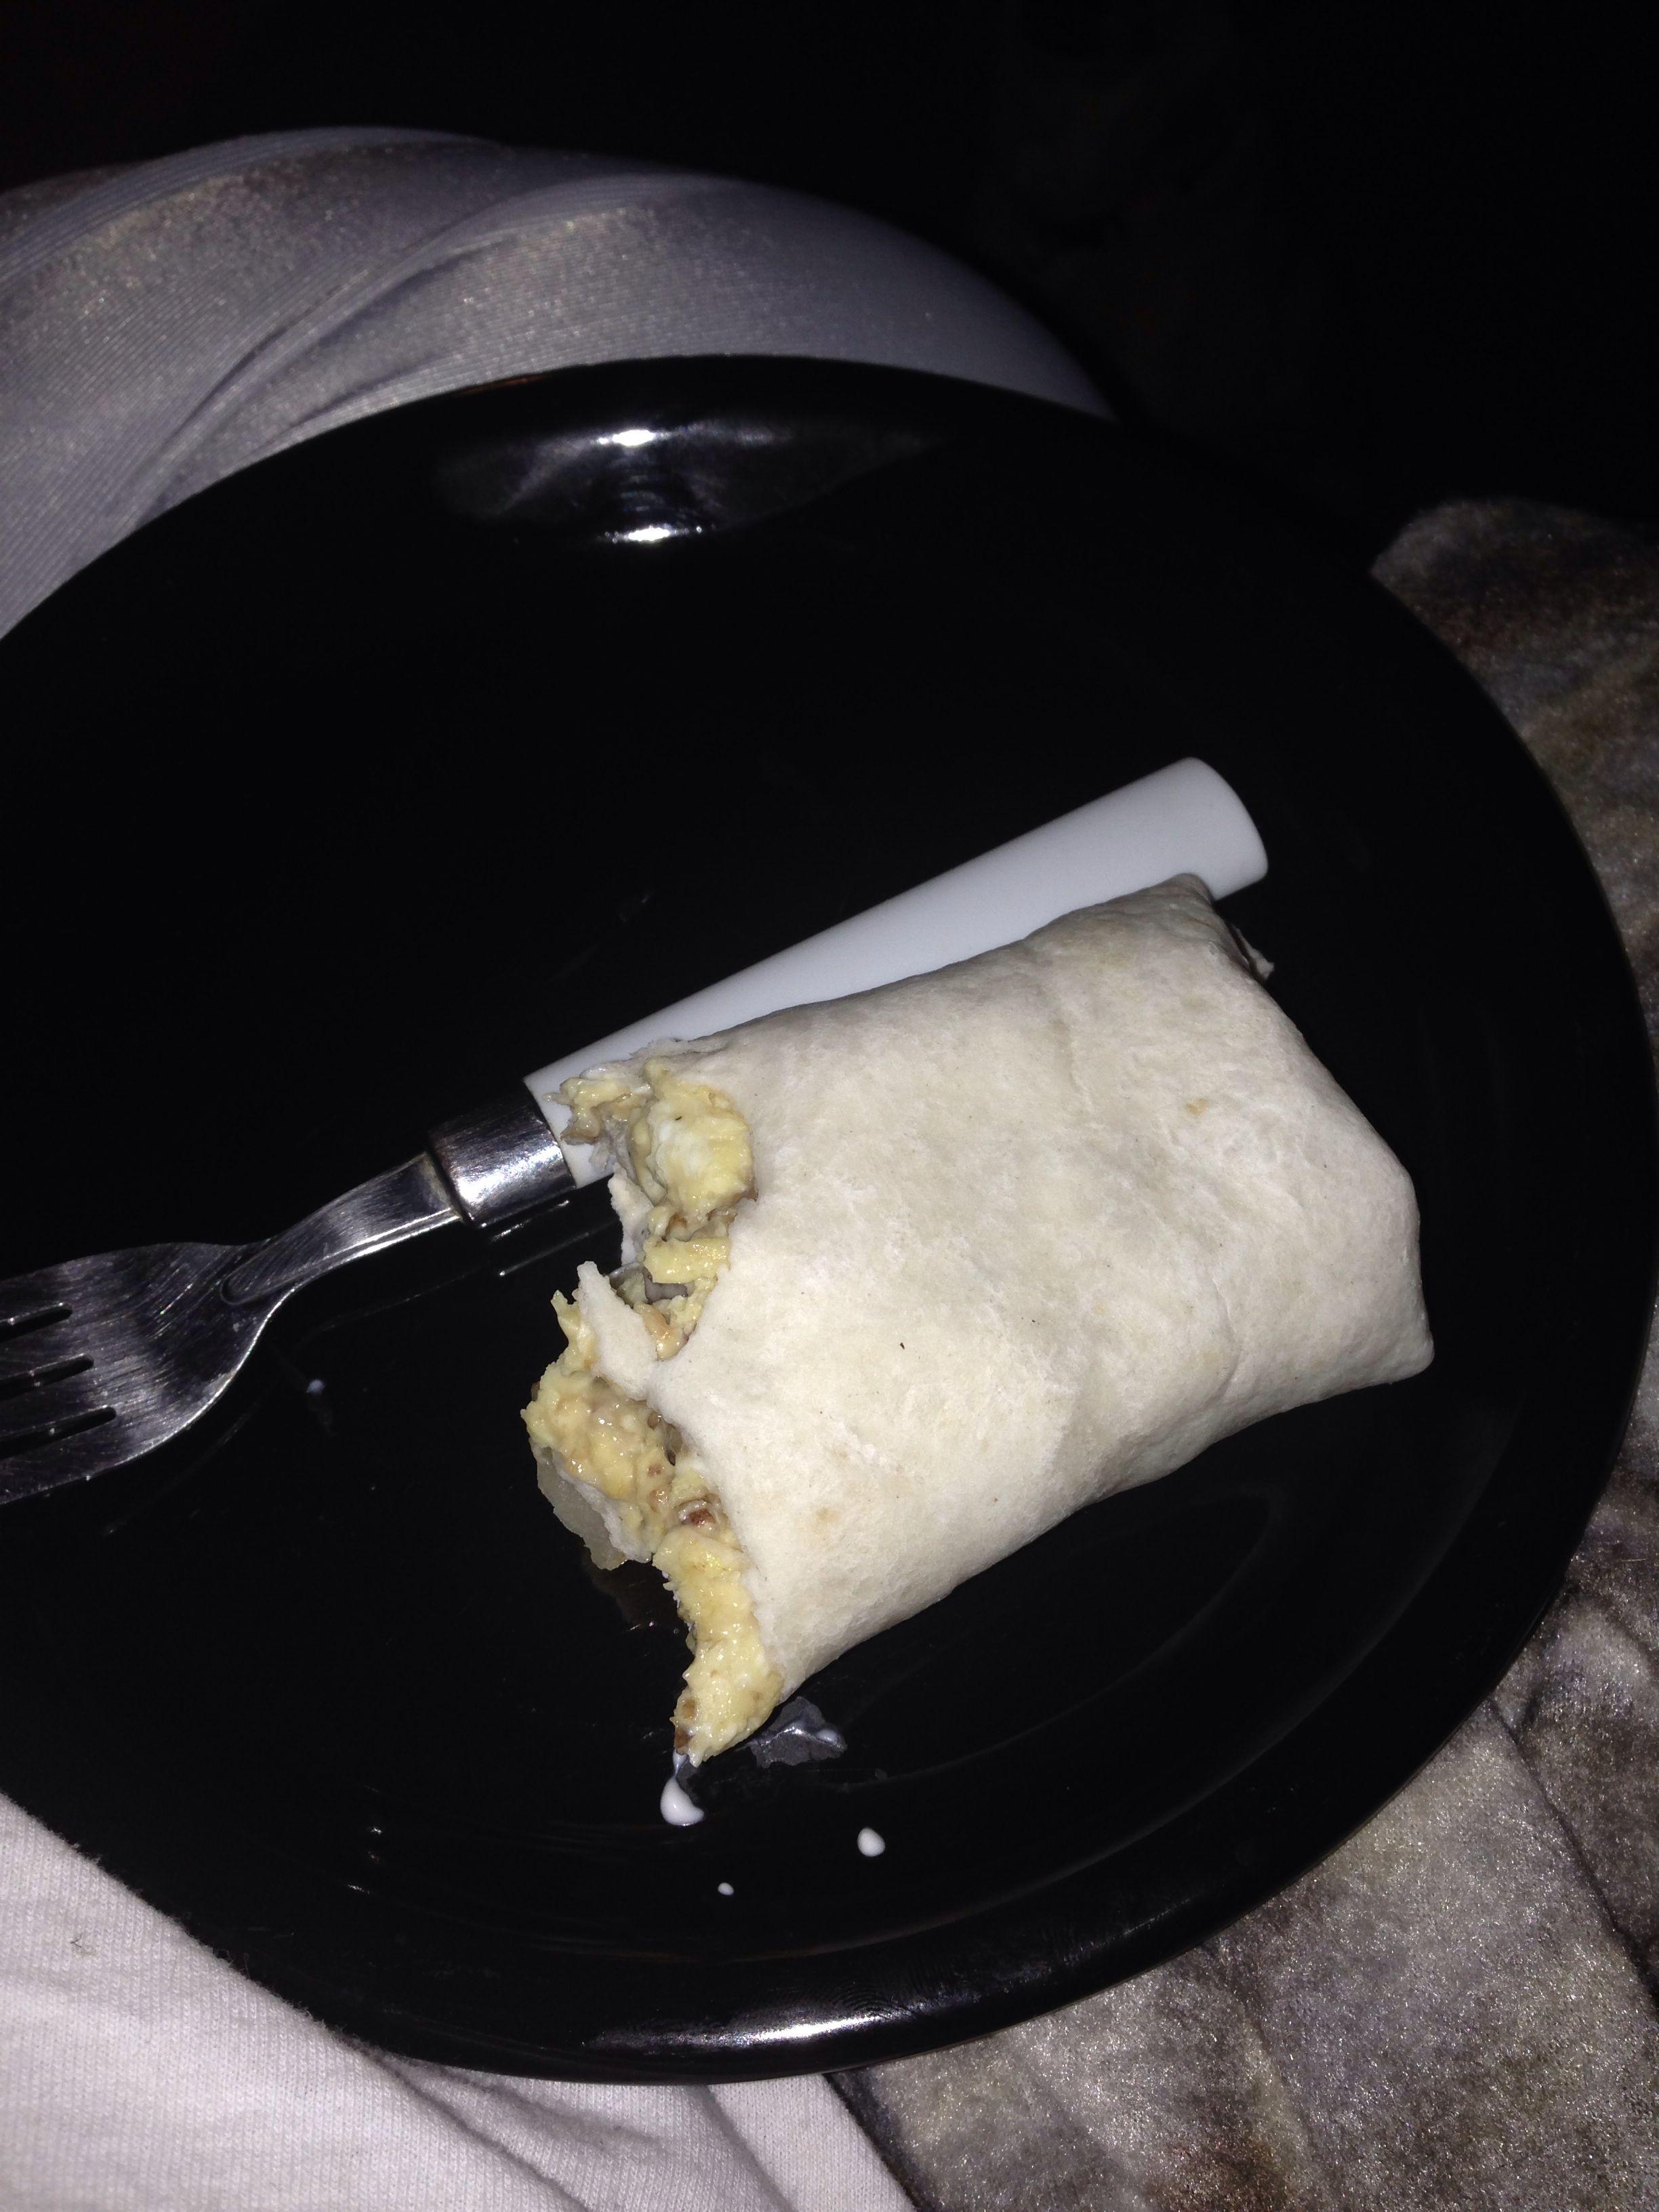 Breakfast burrito. Potatoes, sausage, egg, cheese.